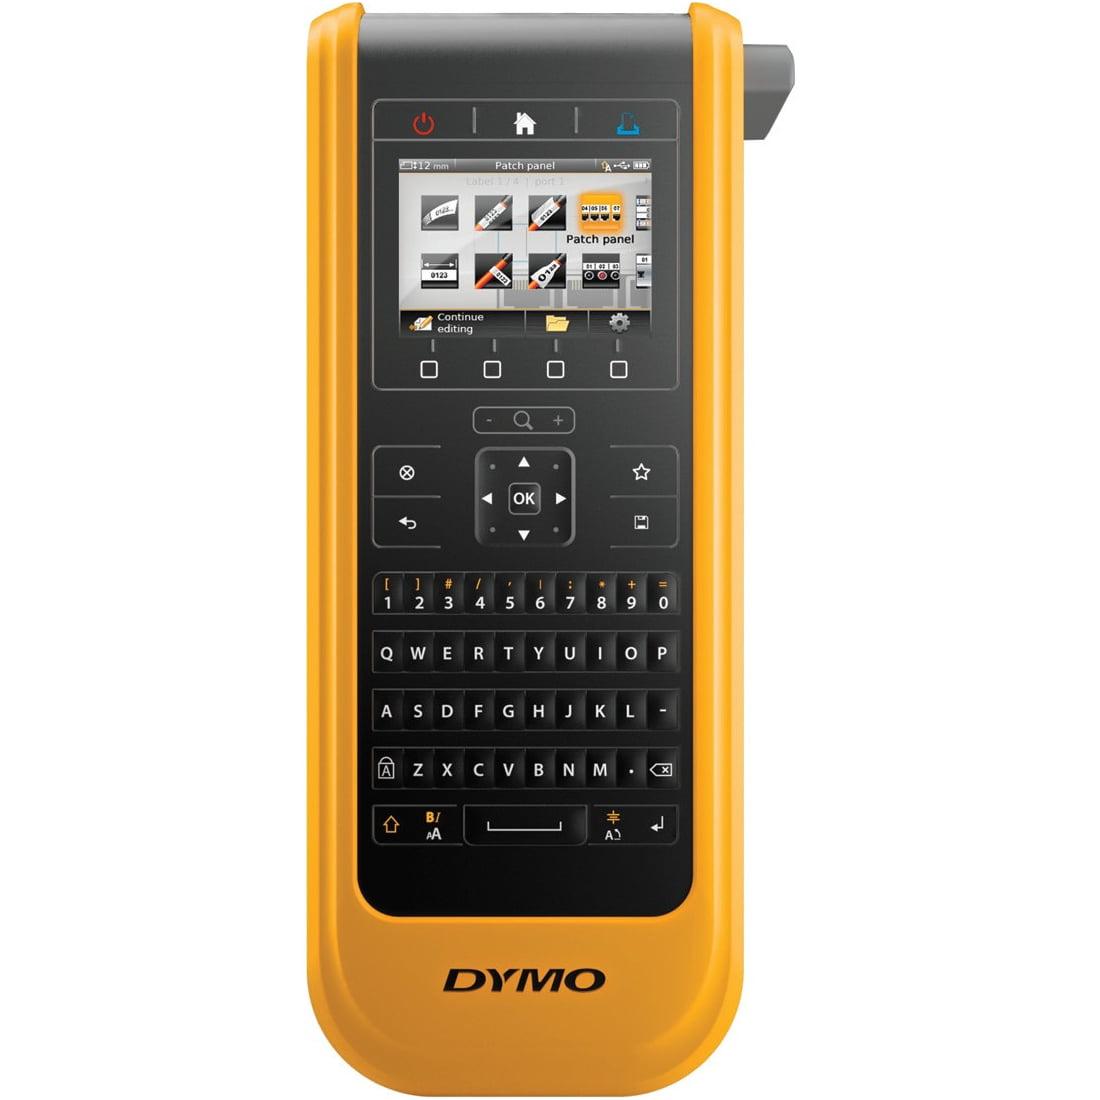 "Dymo Xtl 300 Label Maker - Heat Shrink Tubing, Tape, Label0.24"", 0.94"" Tape Cutter, Built-in Designs Template (1868814)"